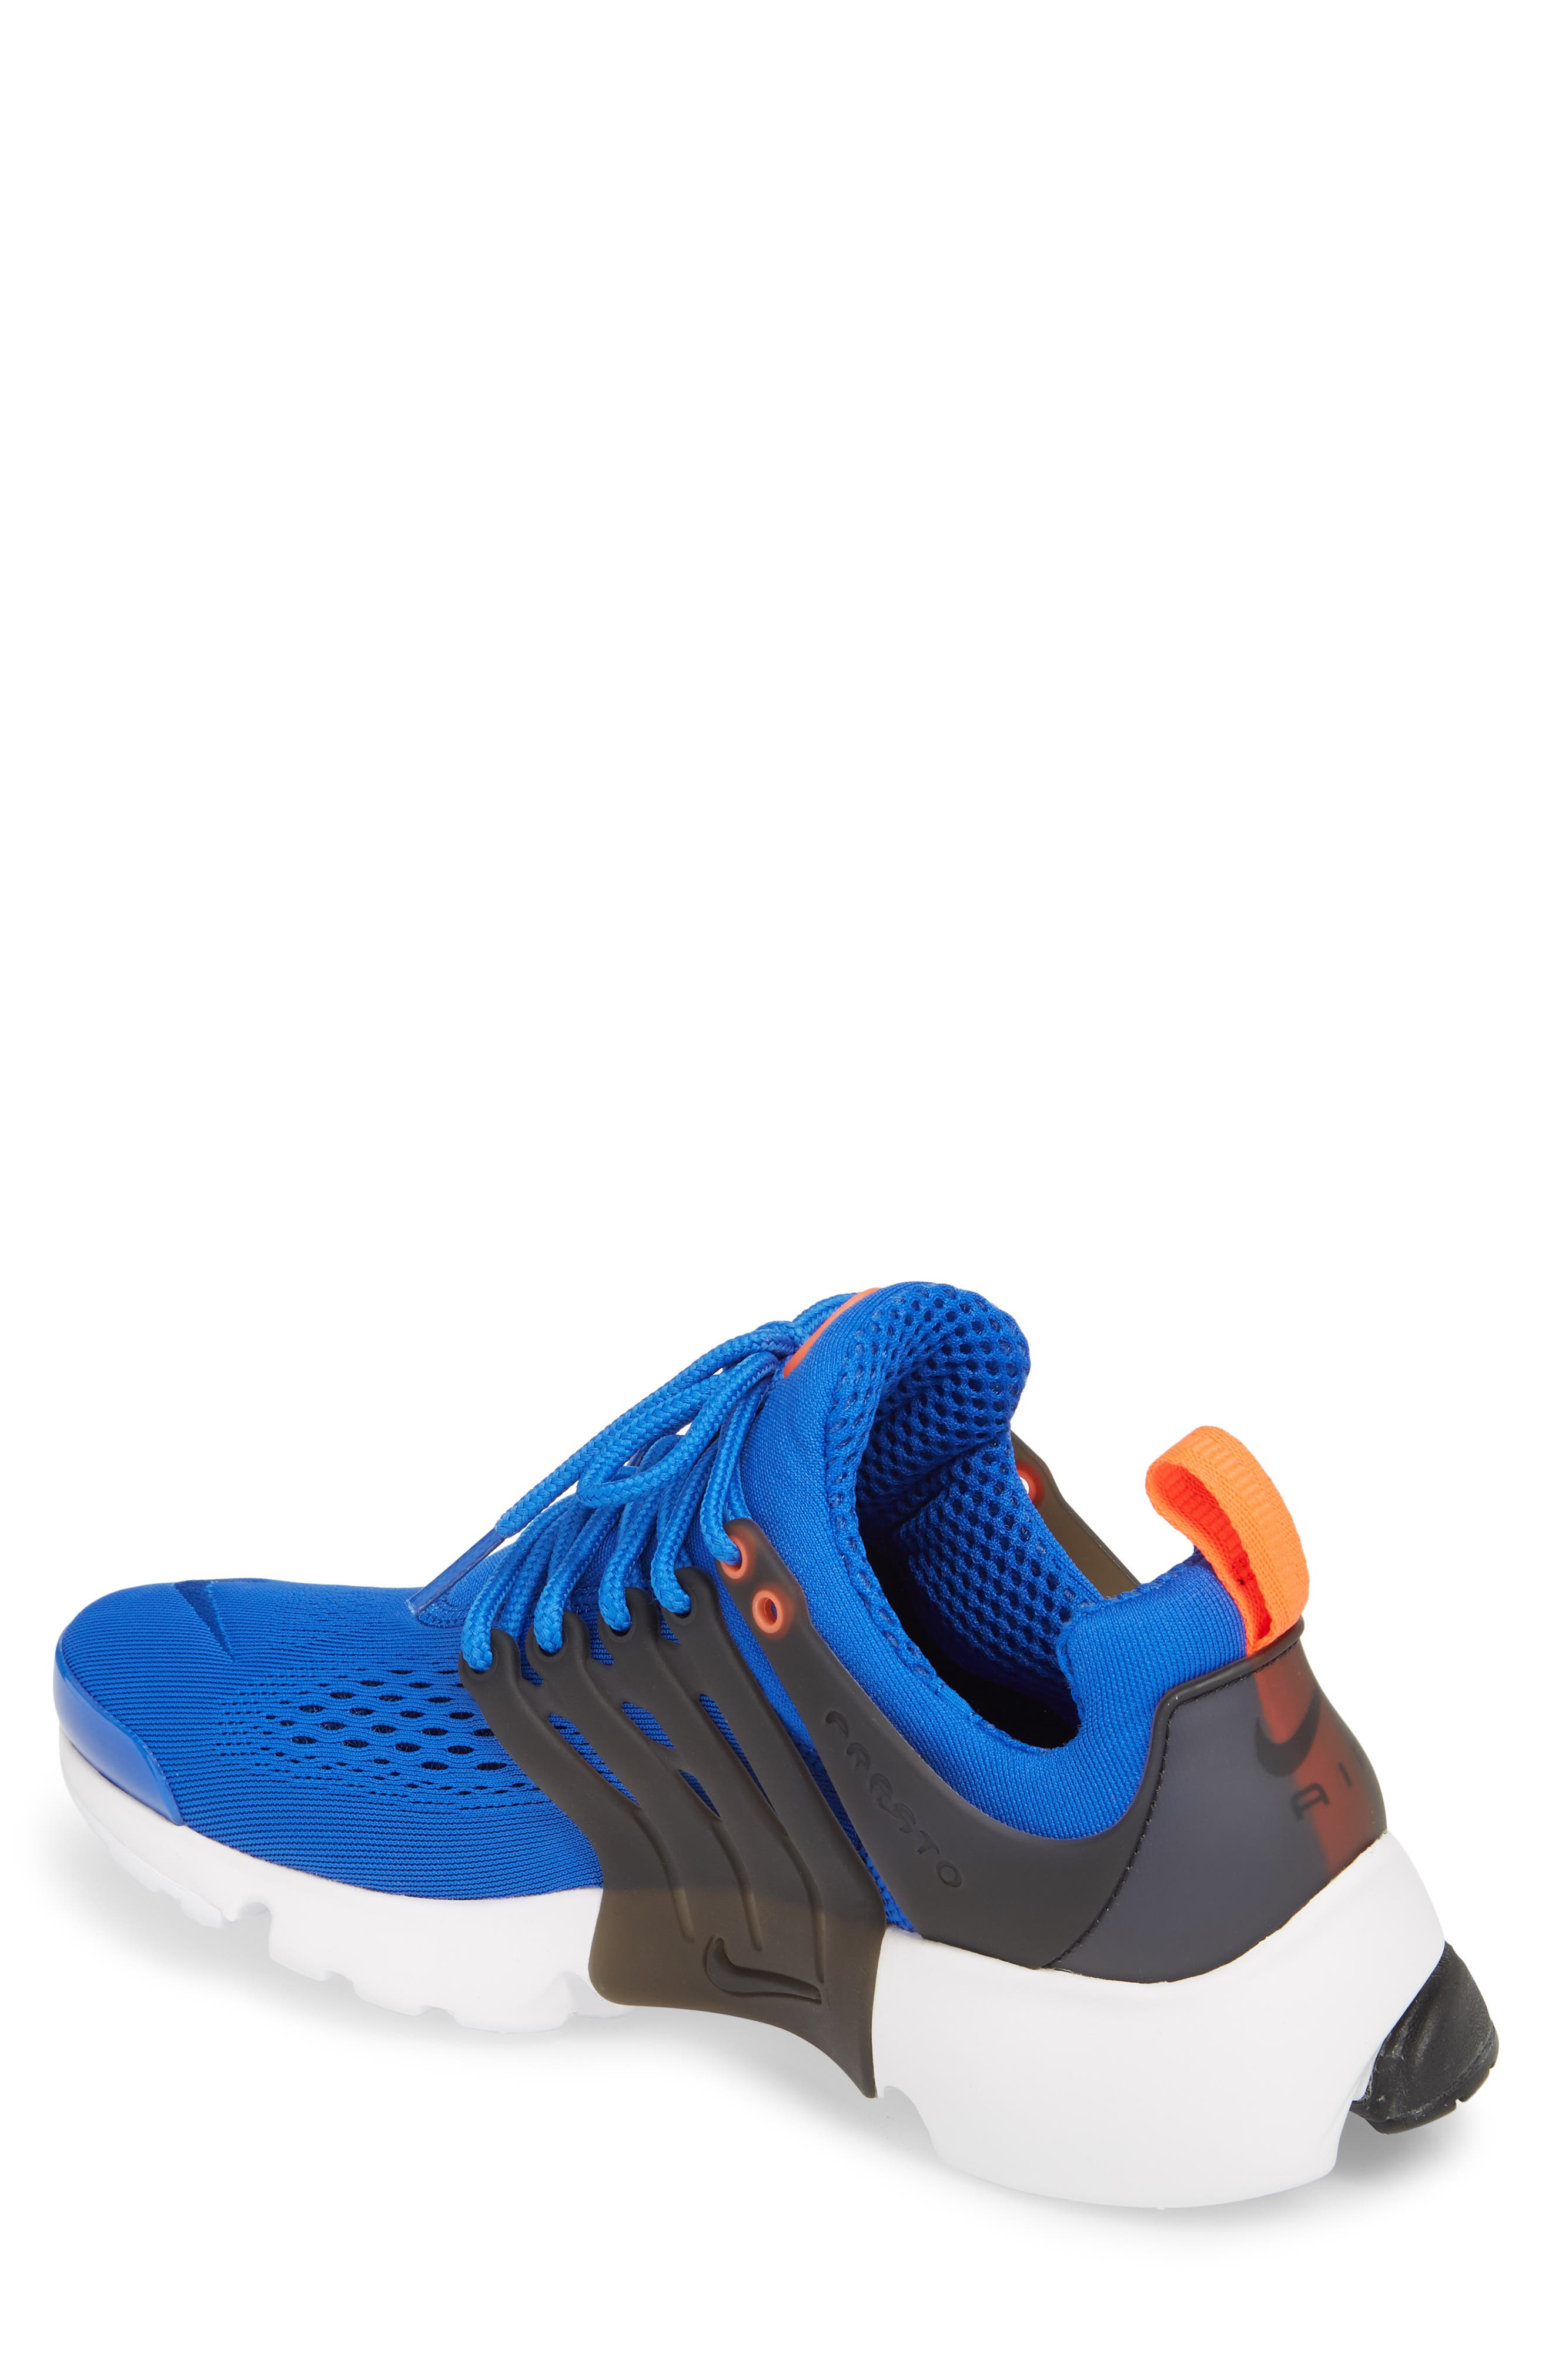 Air Presto Ultra Breathe Sneaker,                             Alternate thumbnail 2, color,                             Racer Blue/ Total Crimson